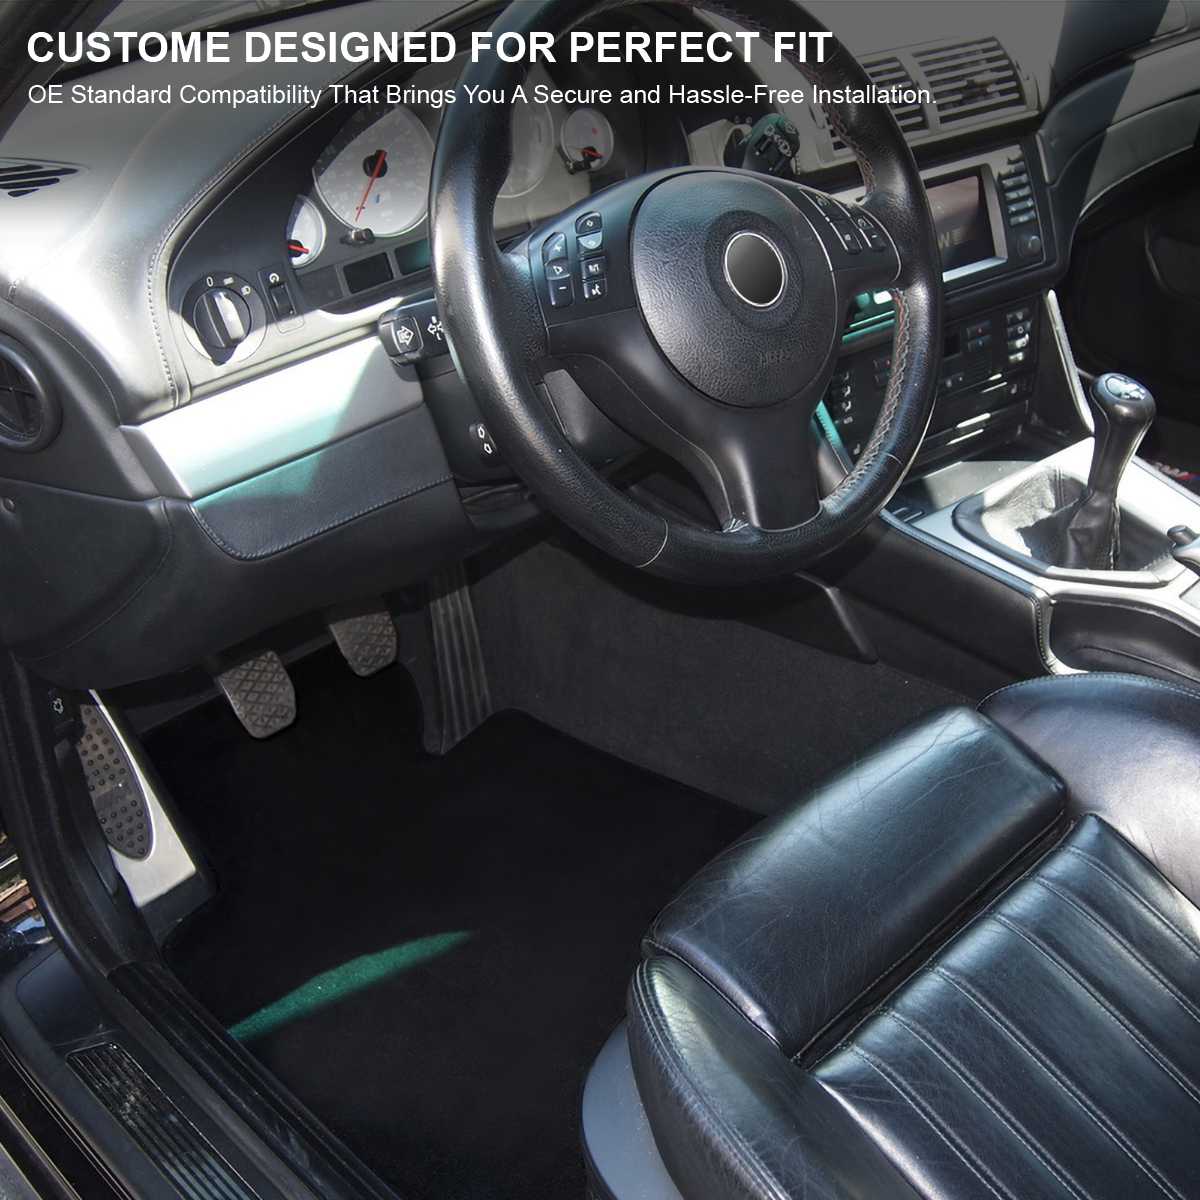 97-03 BMW E39 5-Series Replacement Front+Rear Center Black Carpet Floor Mats 5PC